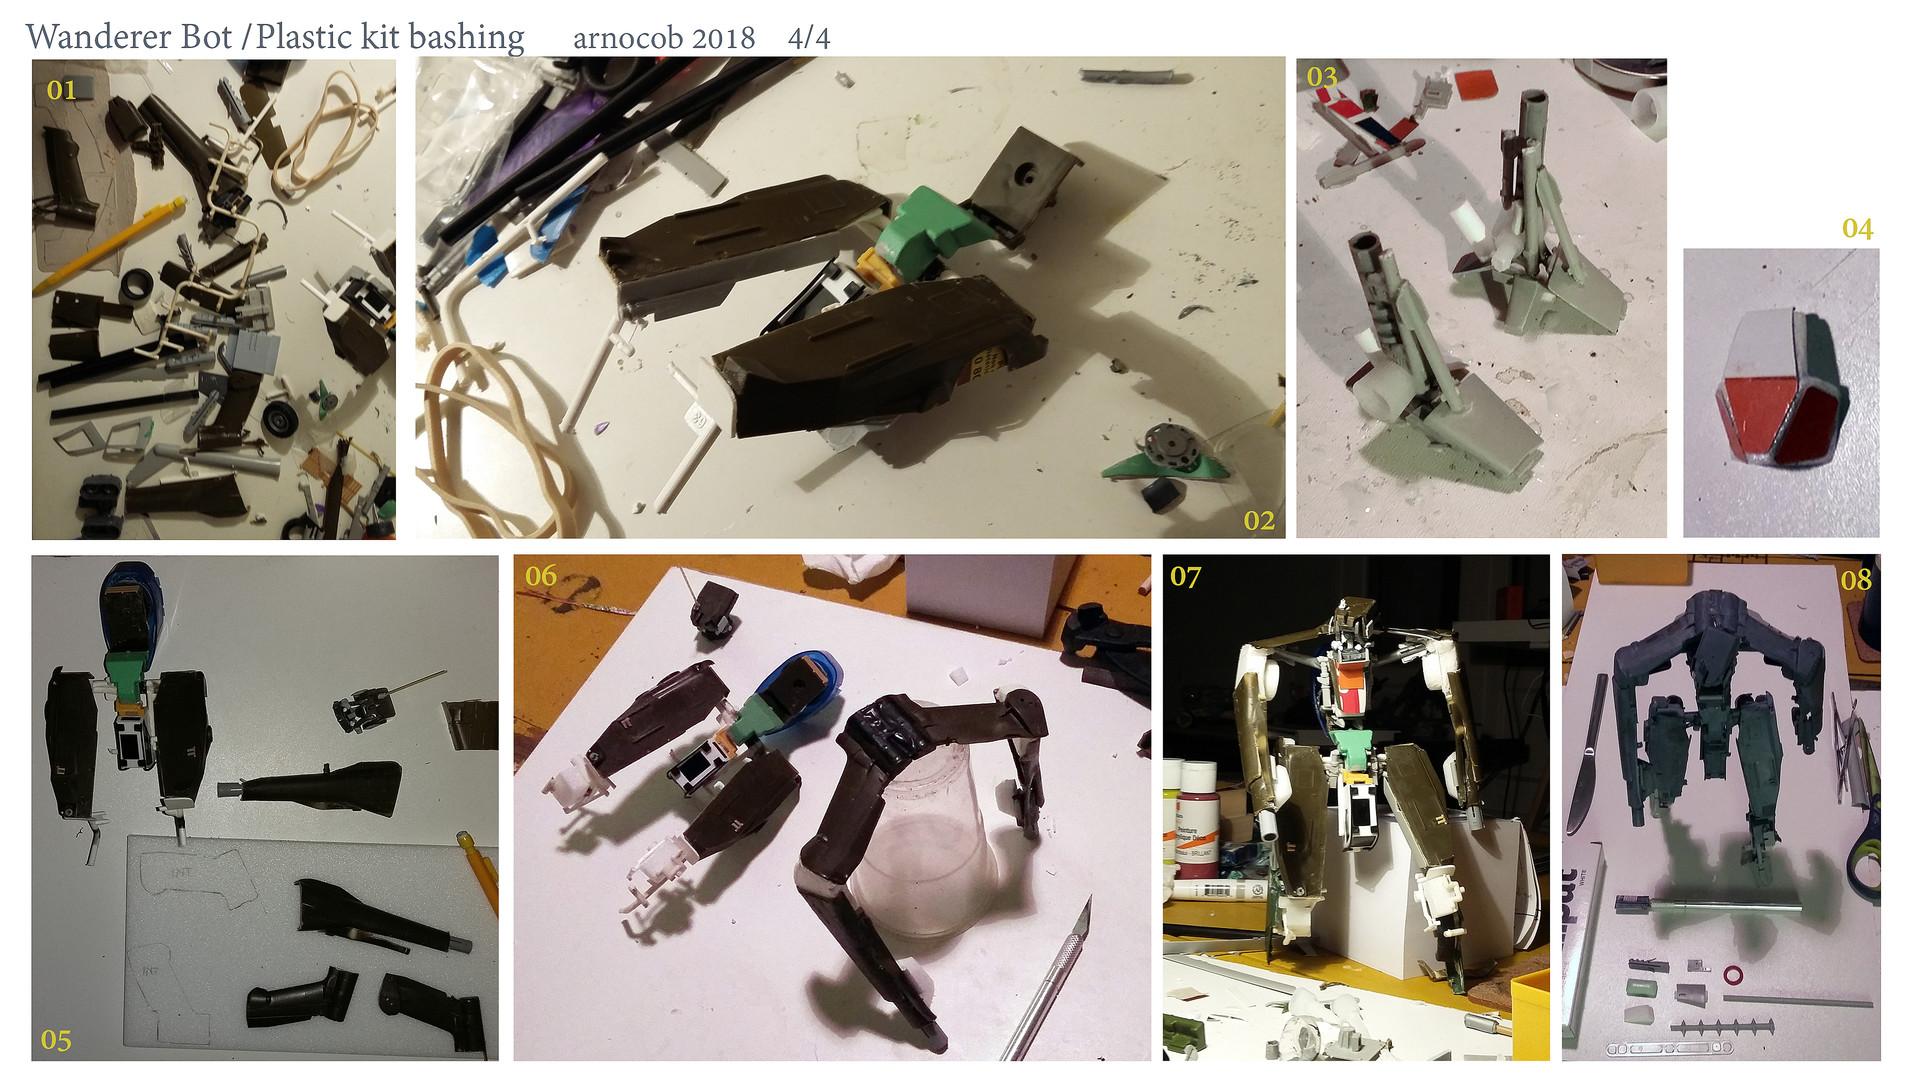 Arnaud caubel wandererbot plastickitbashing arnocob 04